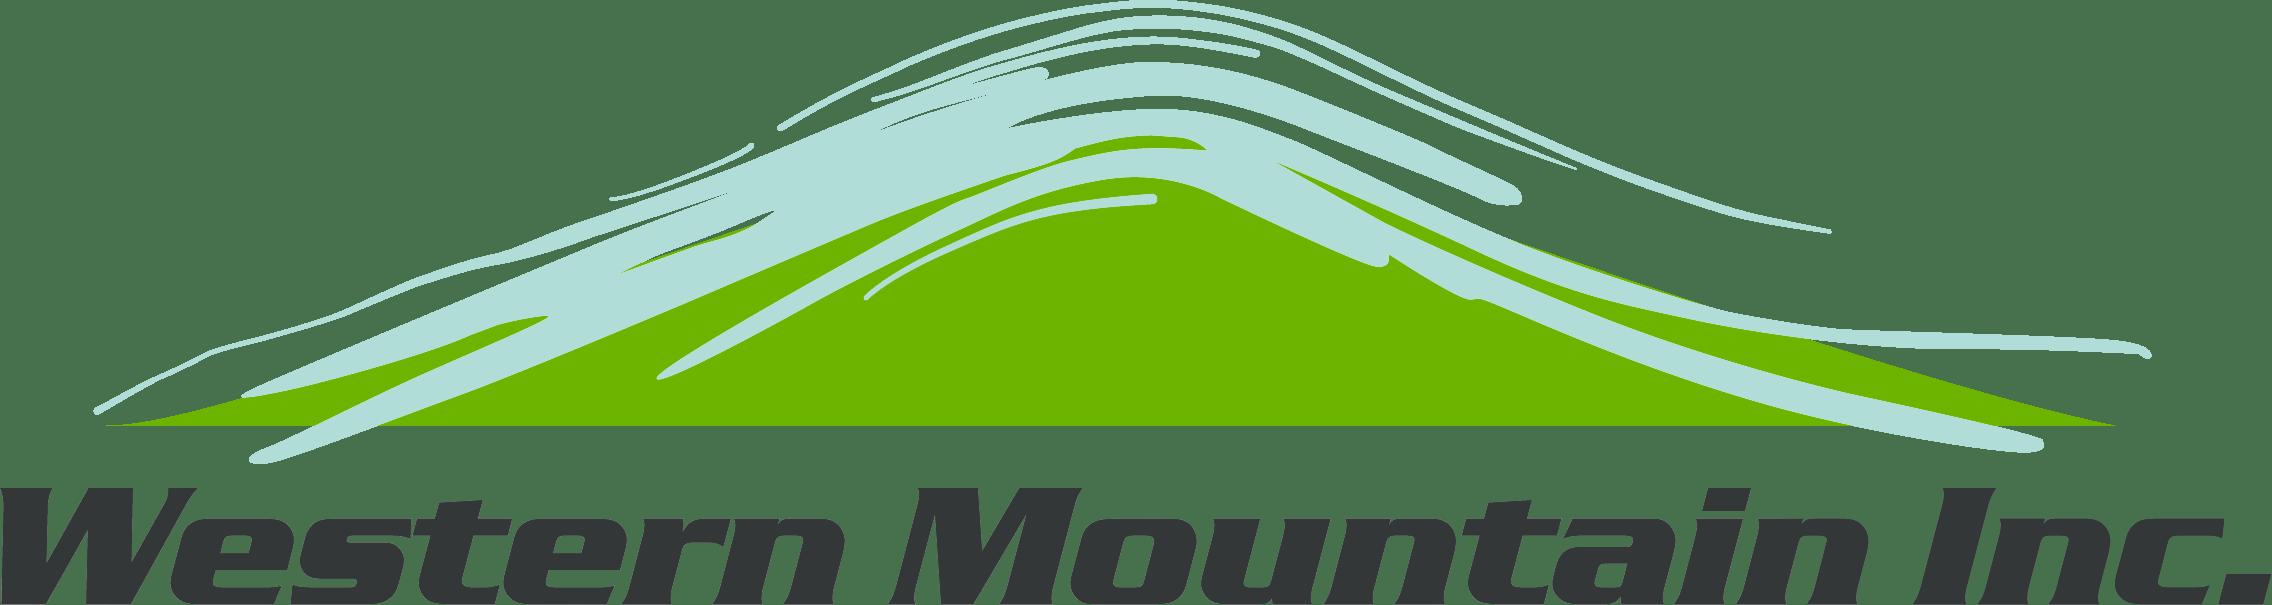 Western Mountain Inc. Energy Construction Services